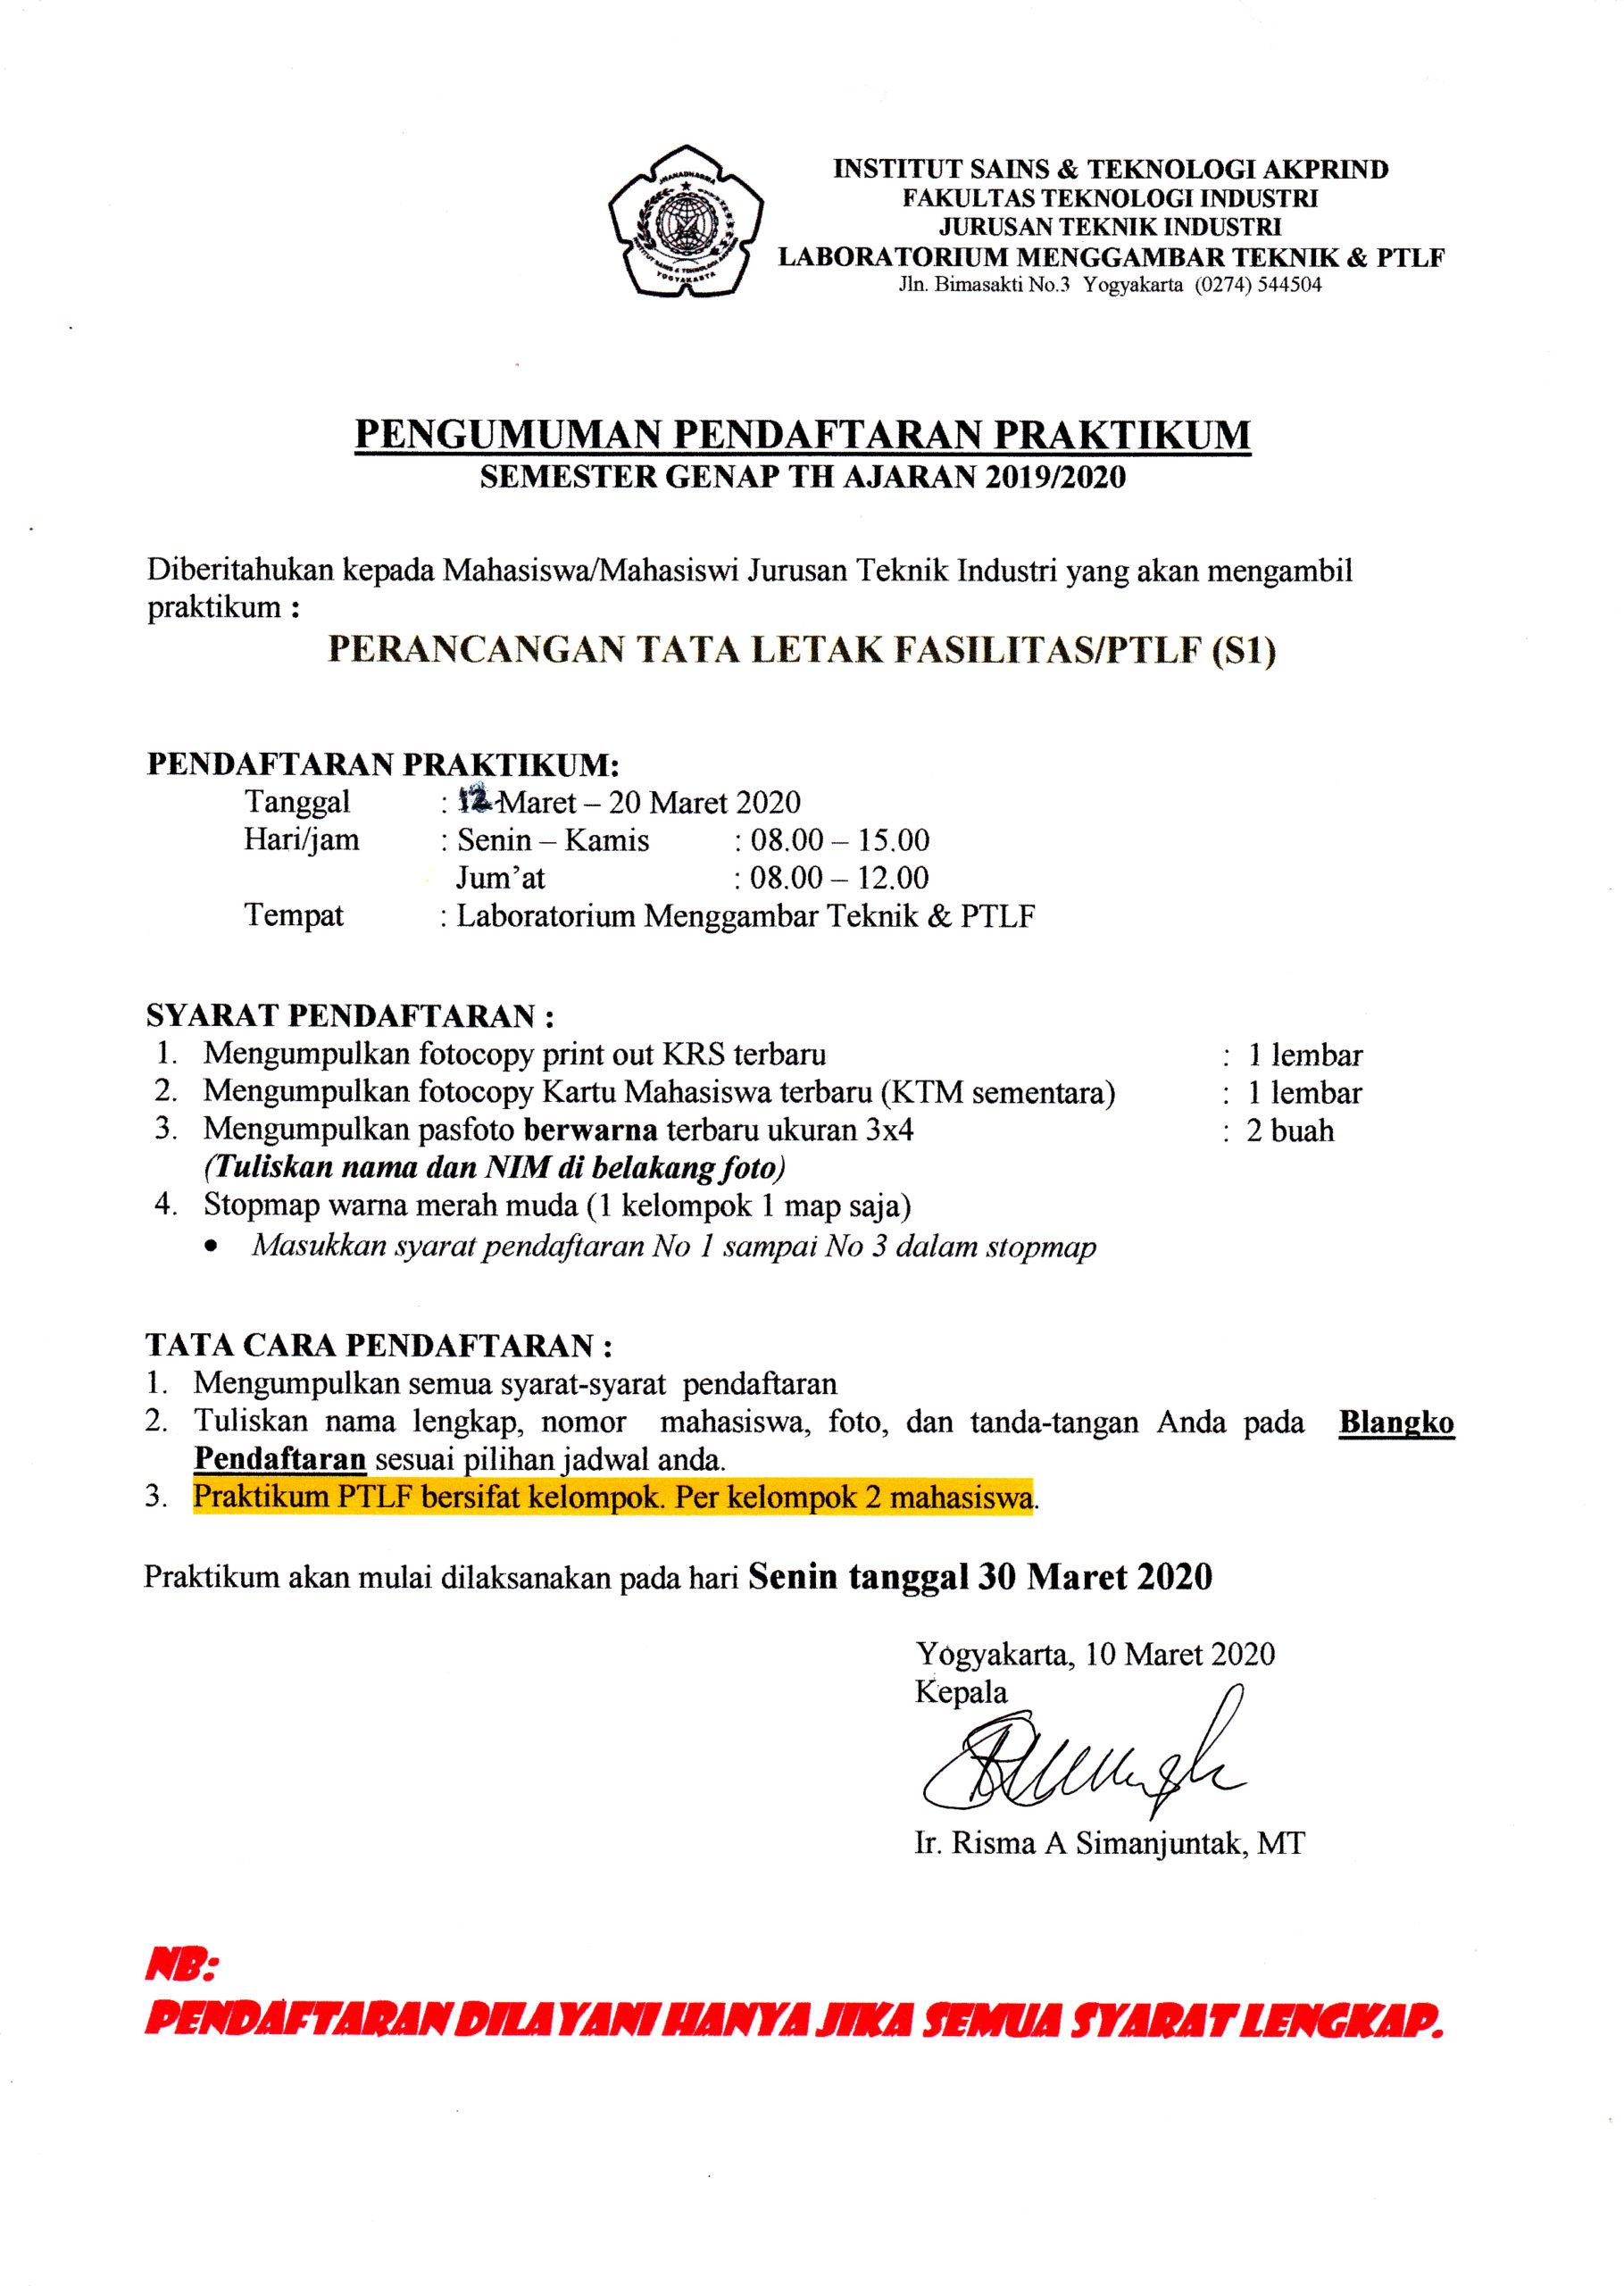 Pendaftaran Praktikum PTLF S1 Sem. Genap TA 2019/2020